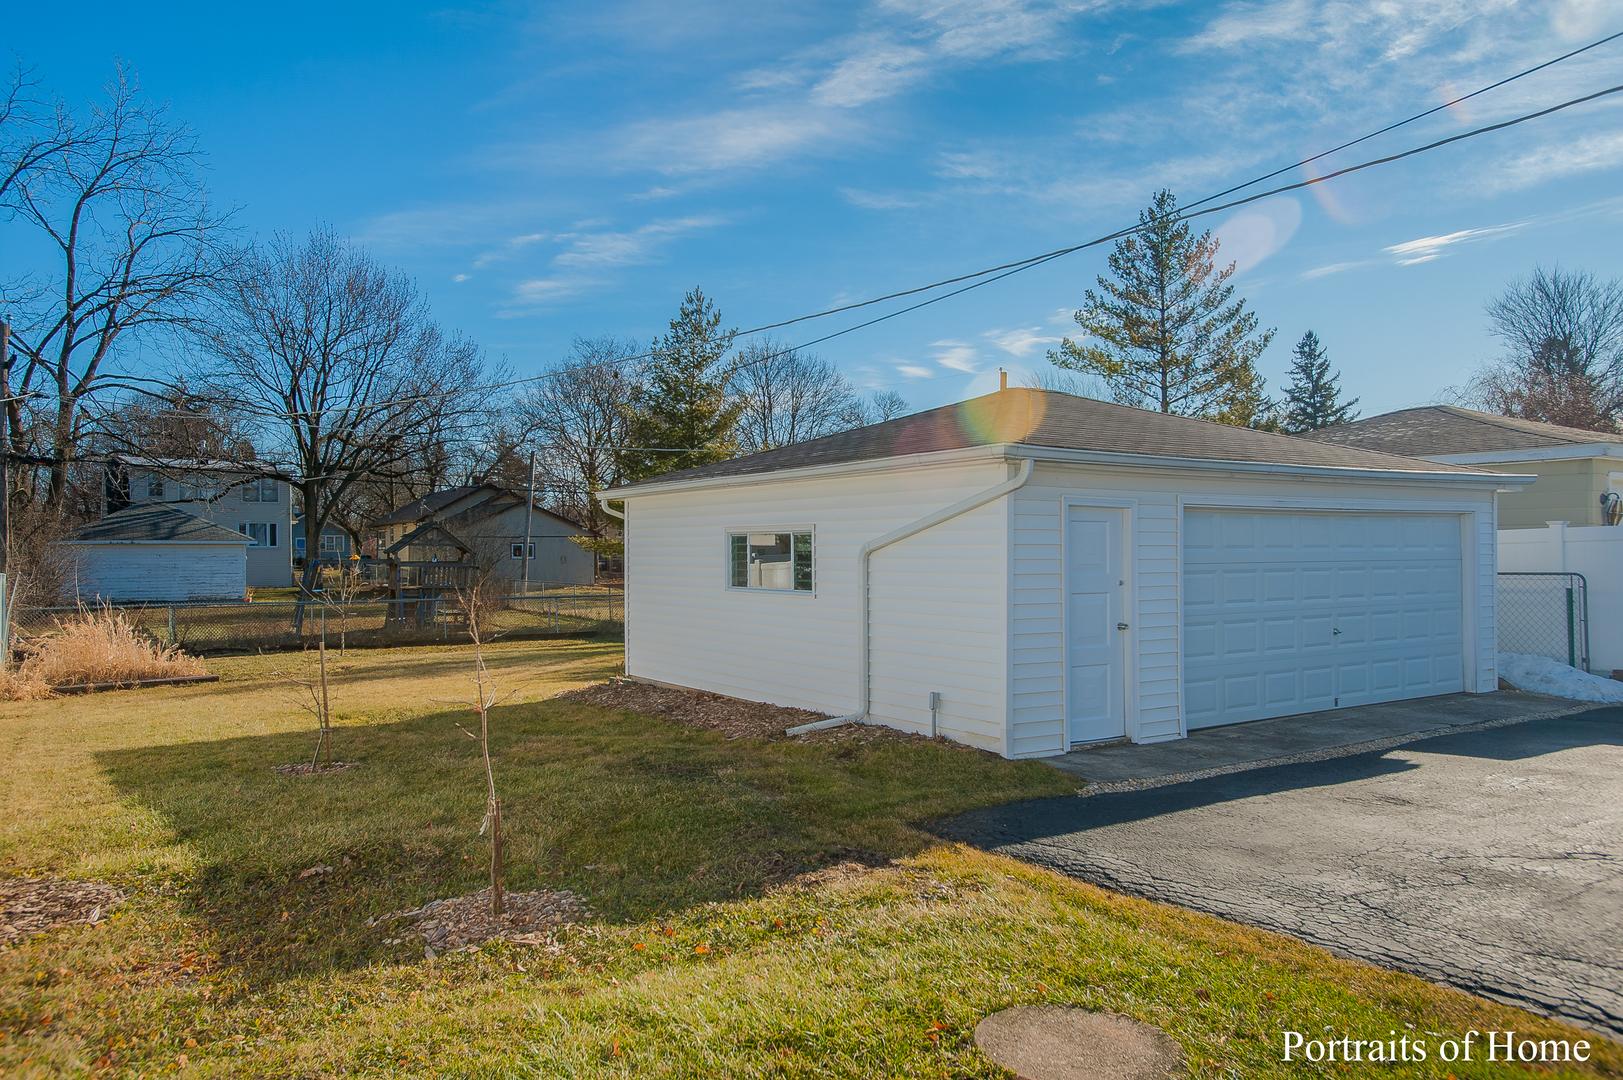 335 South Addison, Villa Park, Illinois, 60181